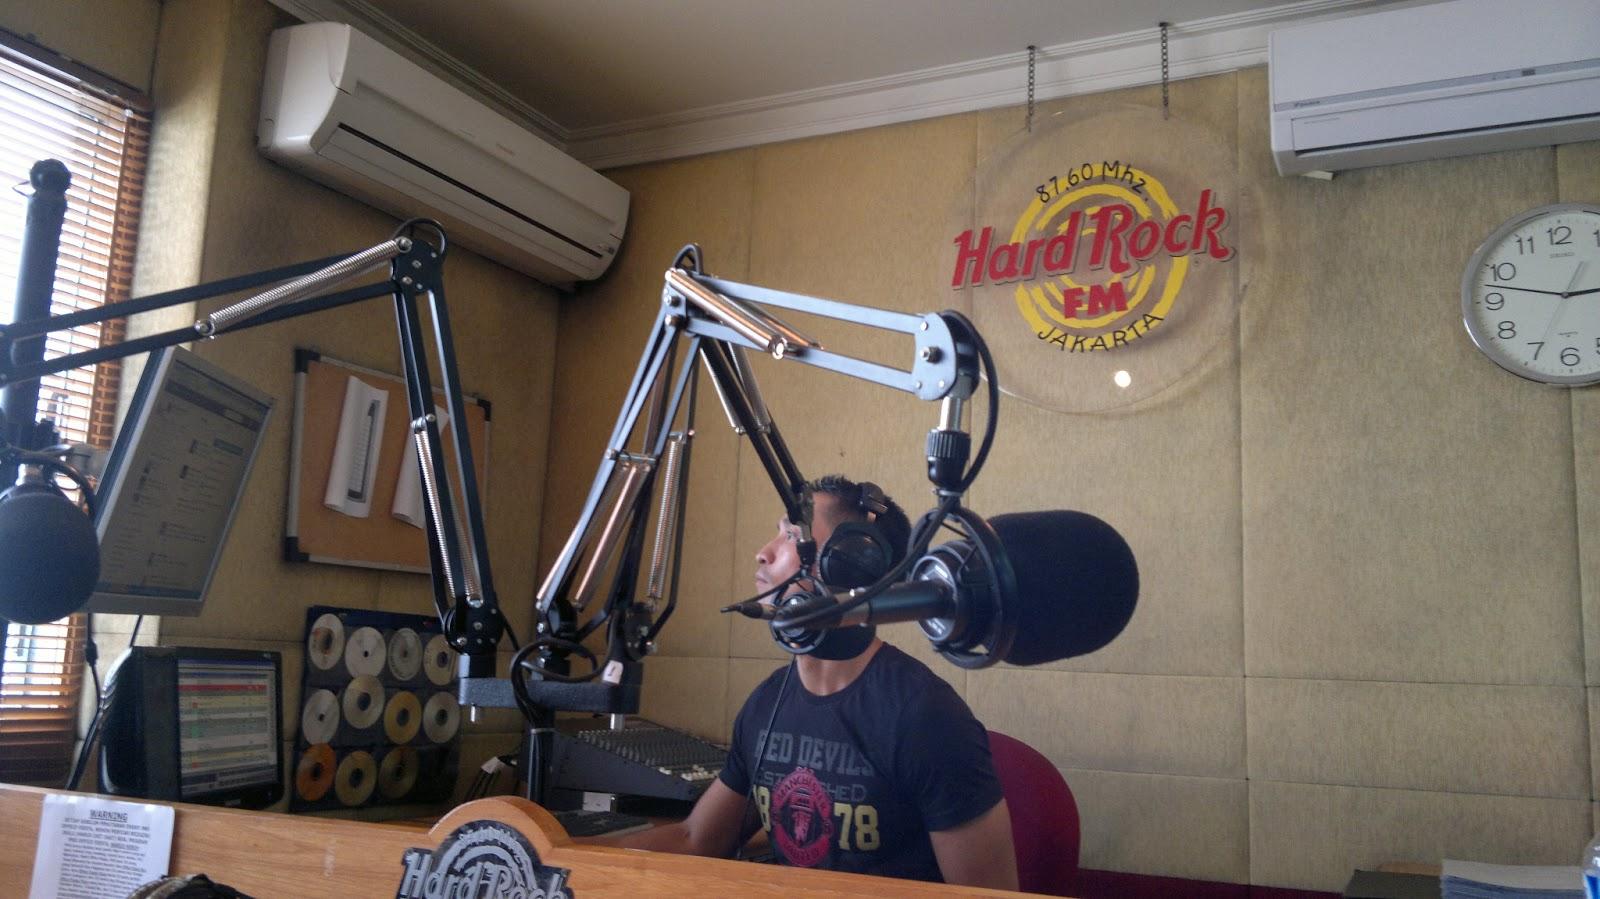 Hardrock FM,86 Jakarta